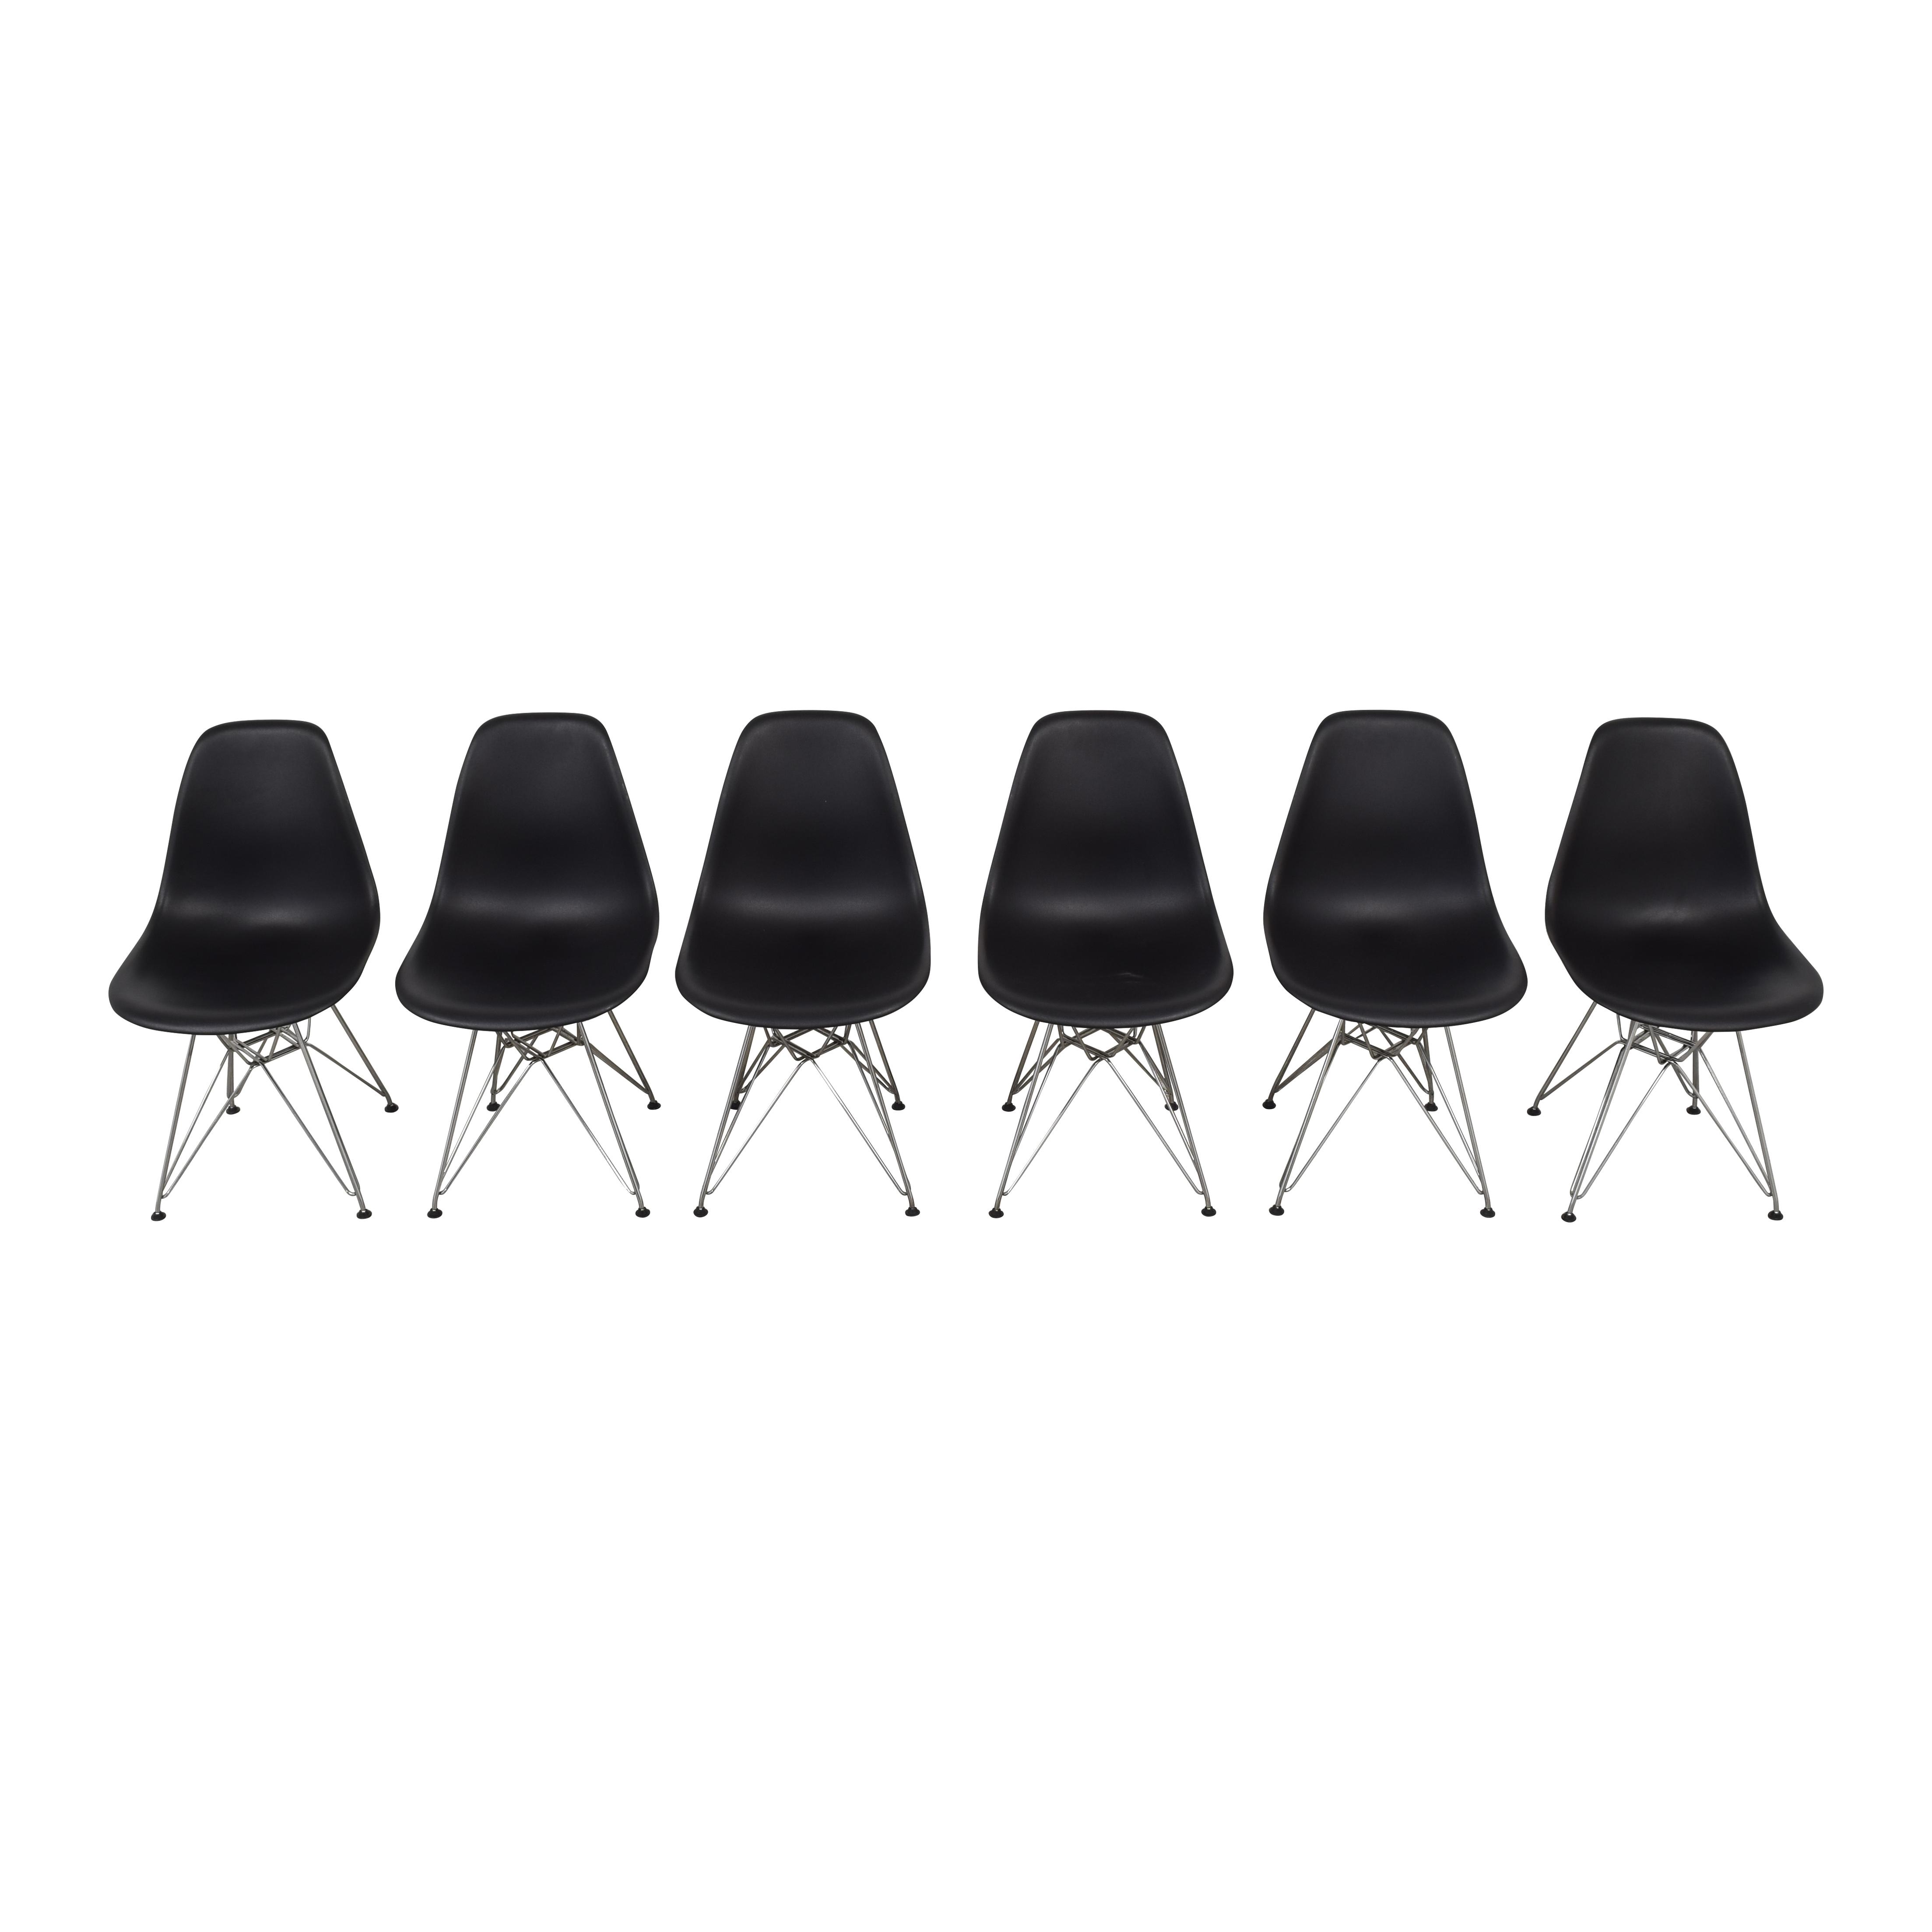 Herman Miller Herman Miller Eames Molded Plastic Wirebase Chairs